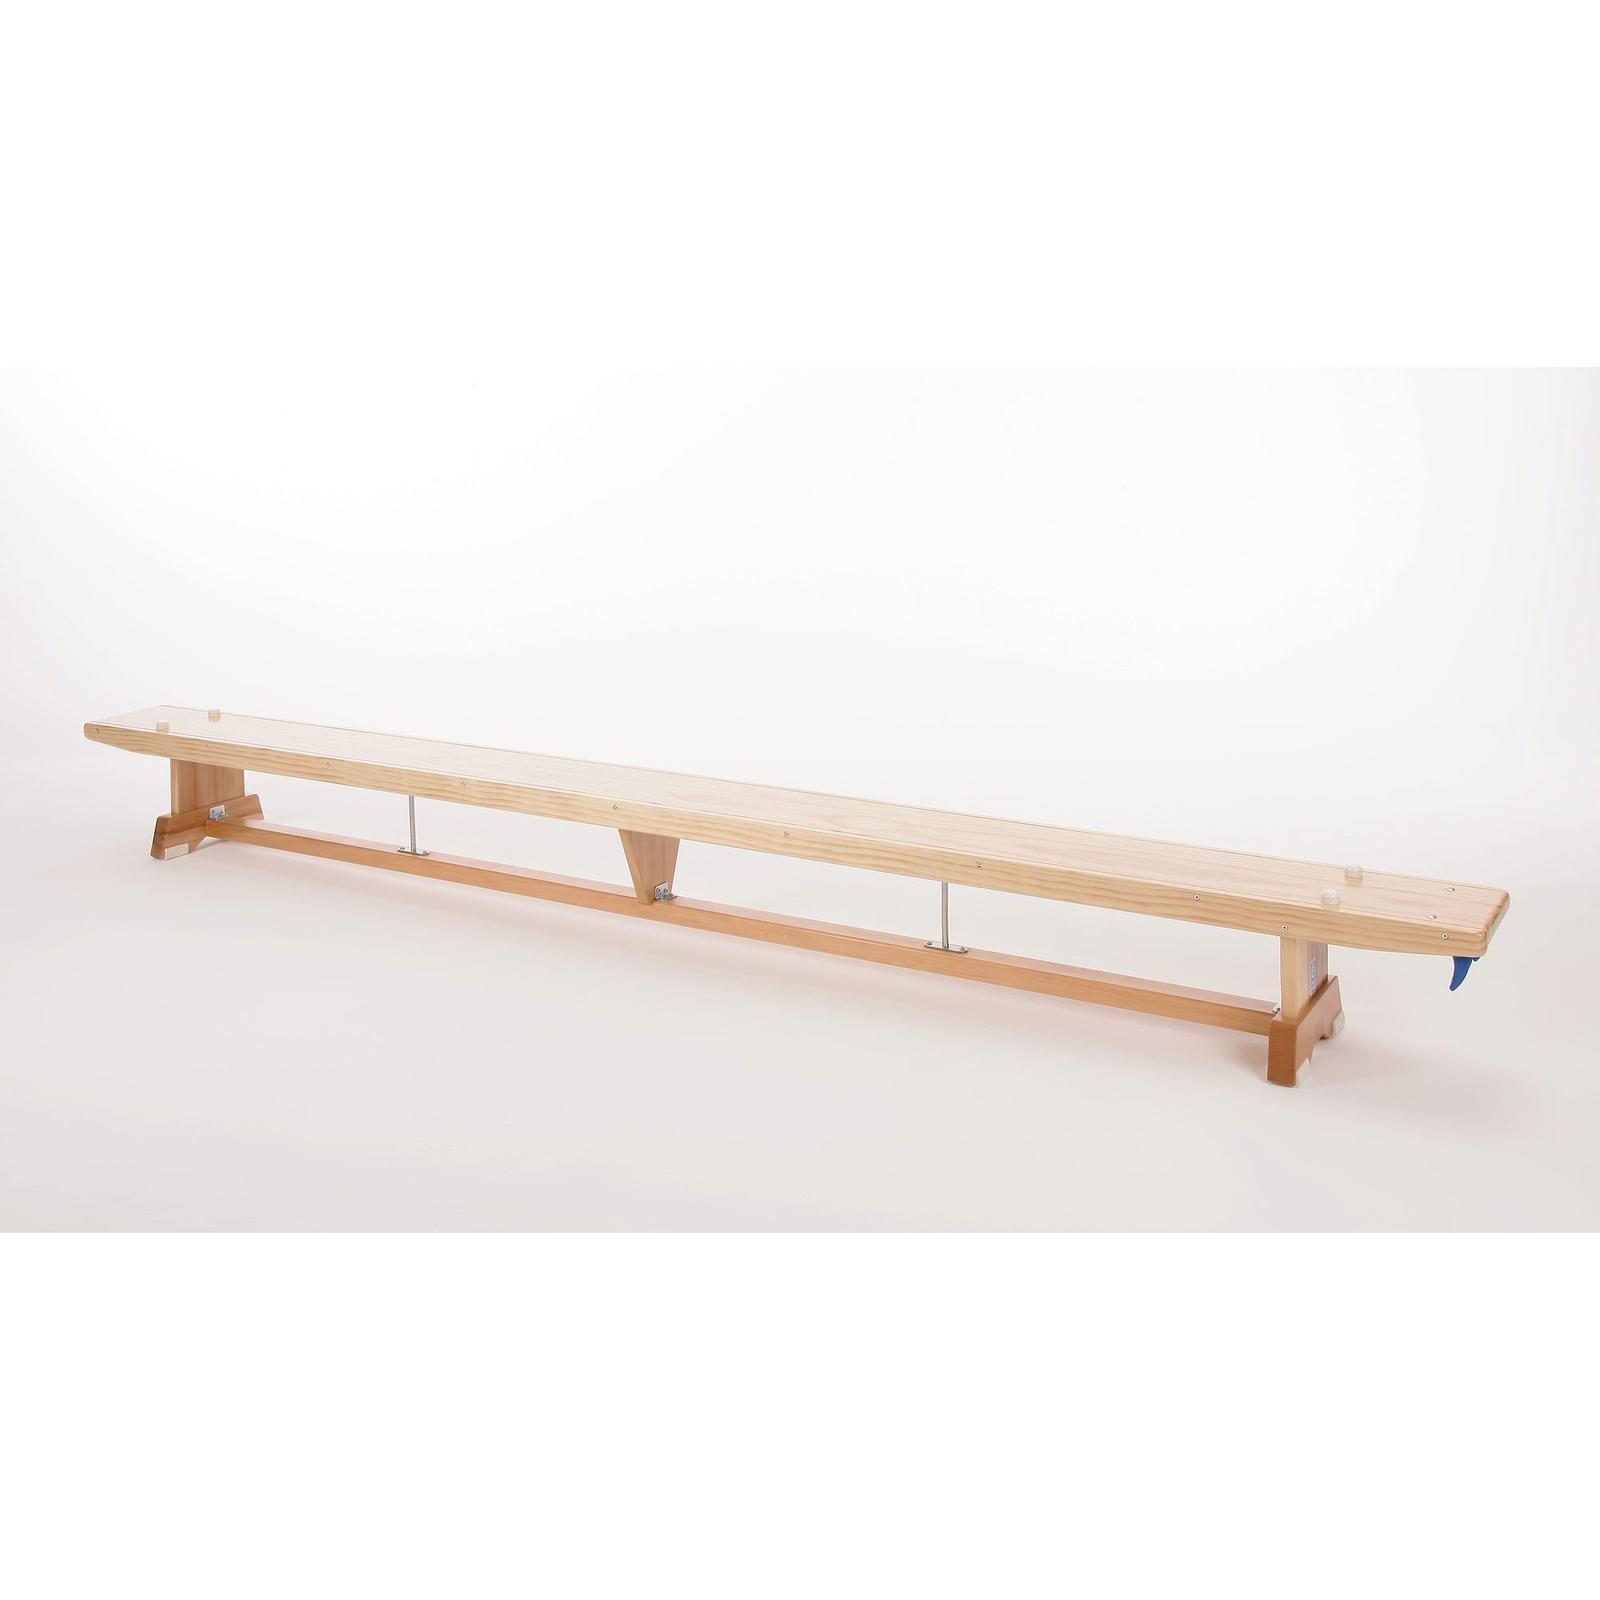 Balance Bench - 3.35m - Hooks Both Ends